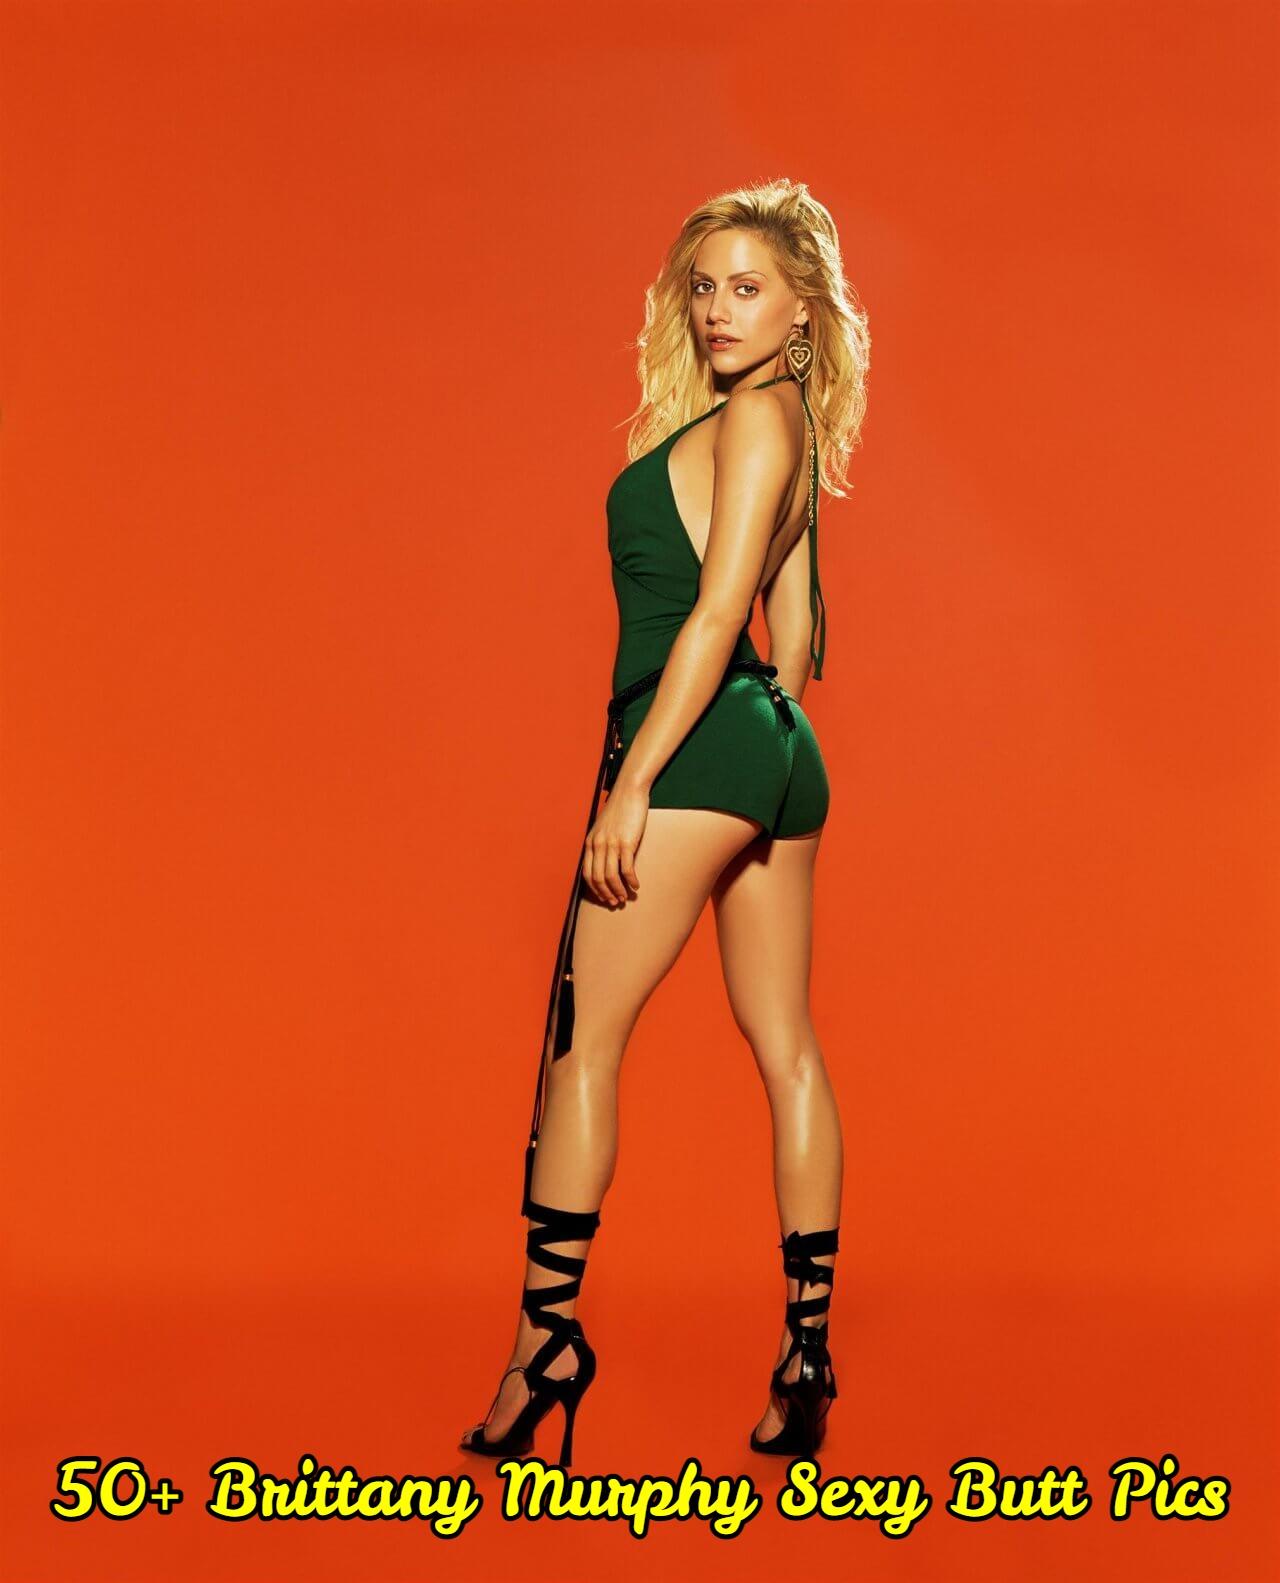 Brittany Murphy Sexy Butt Pics